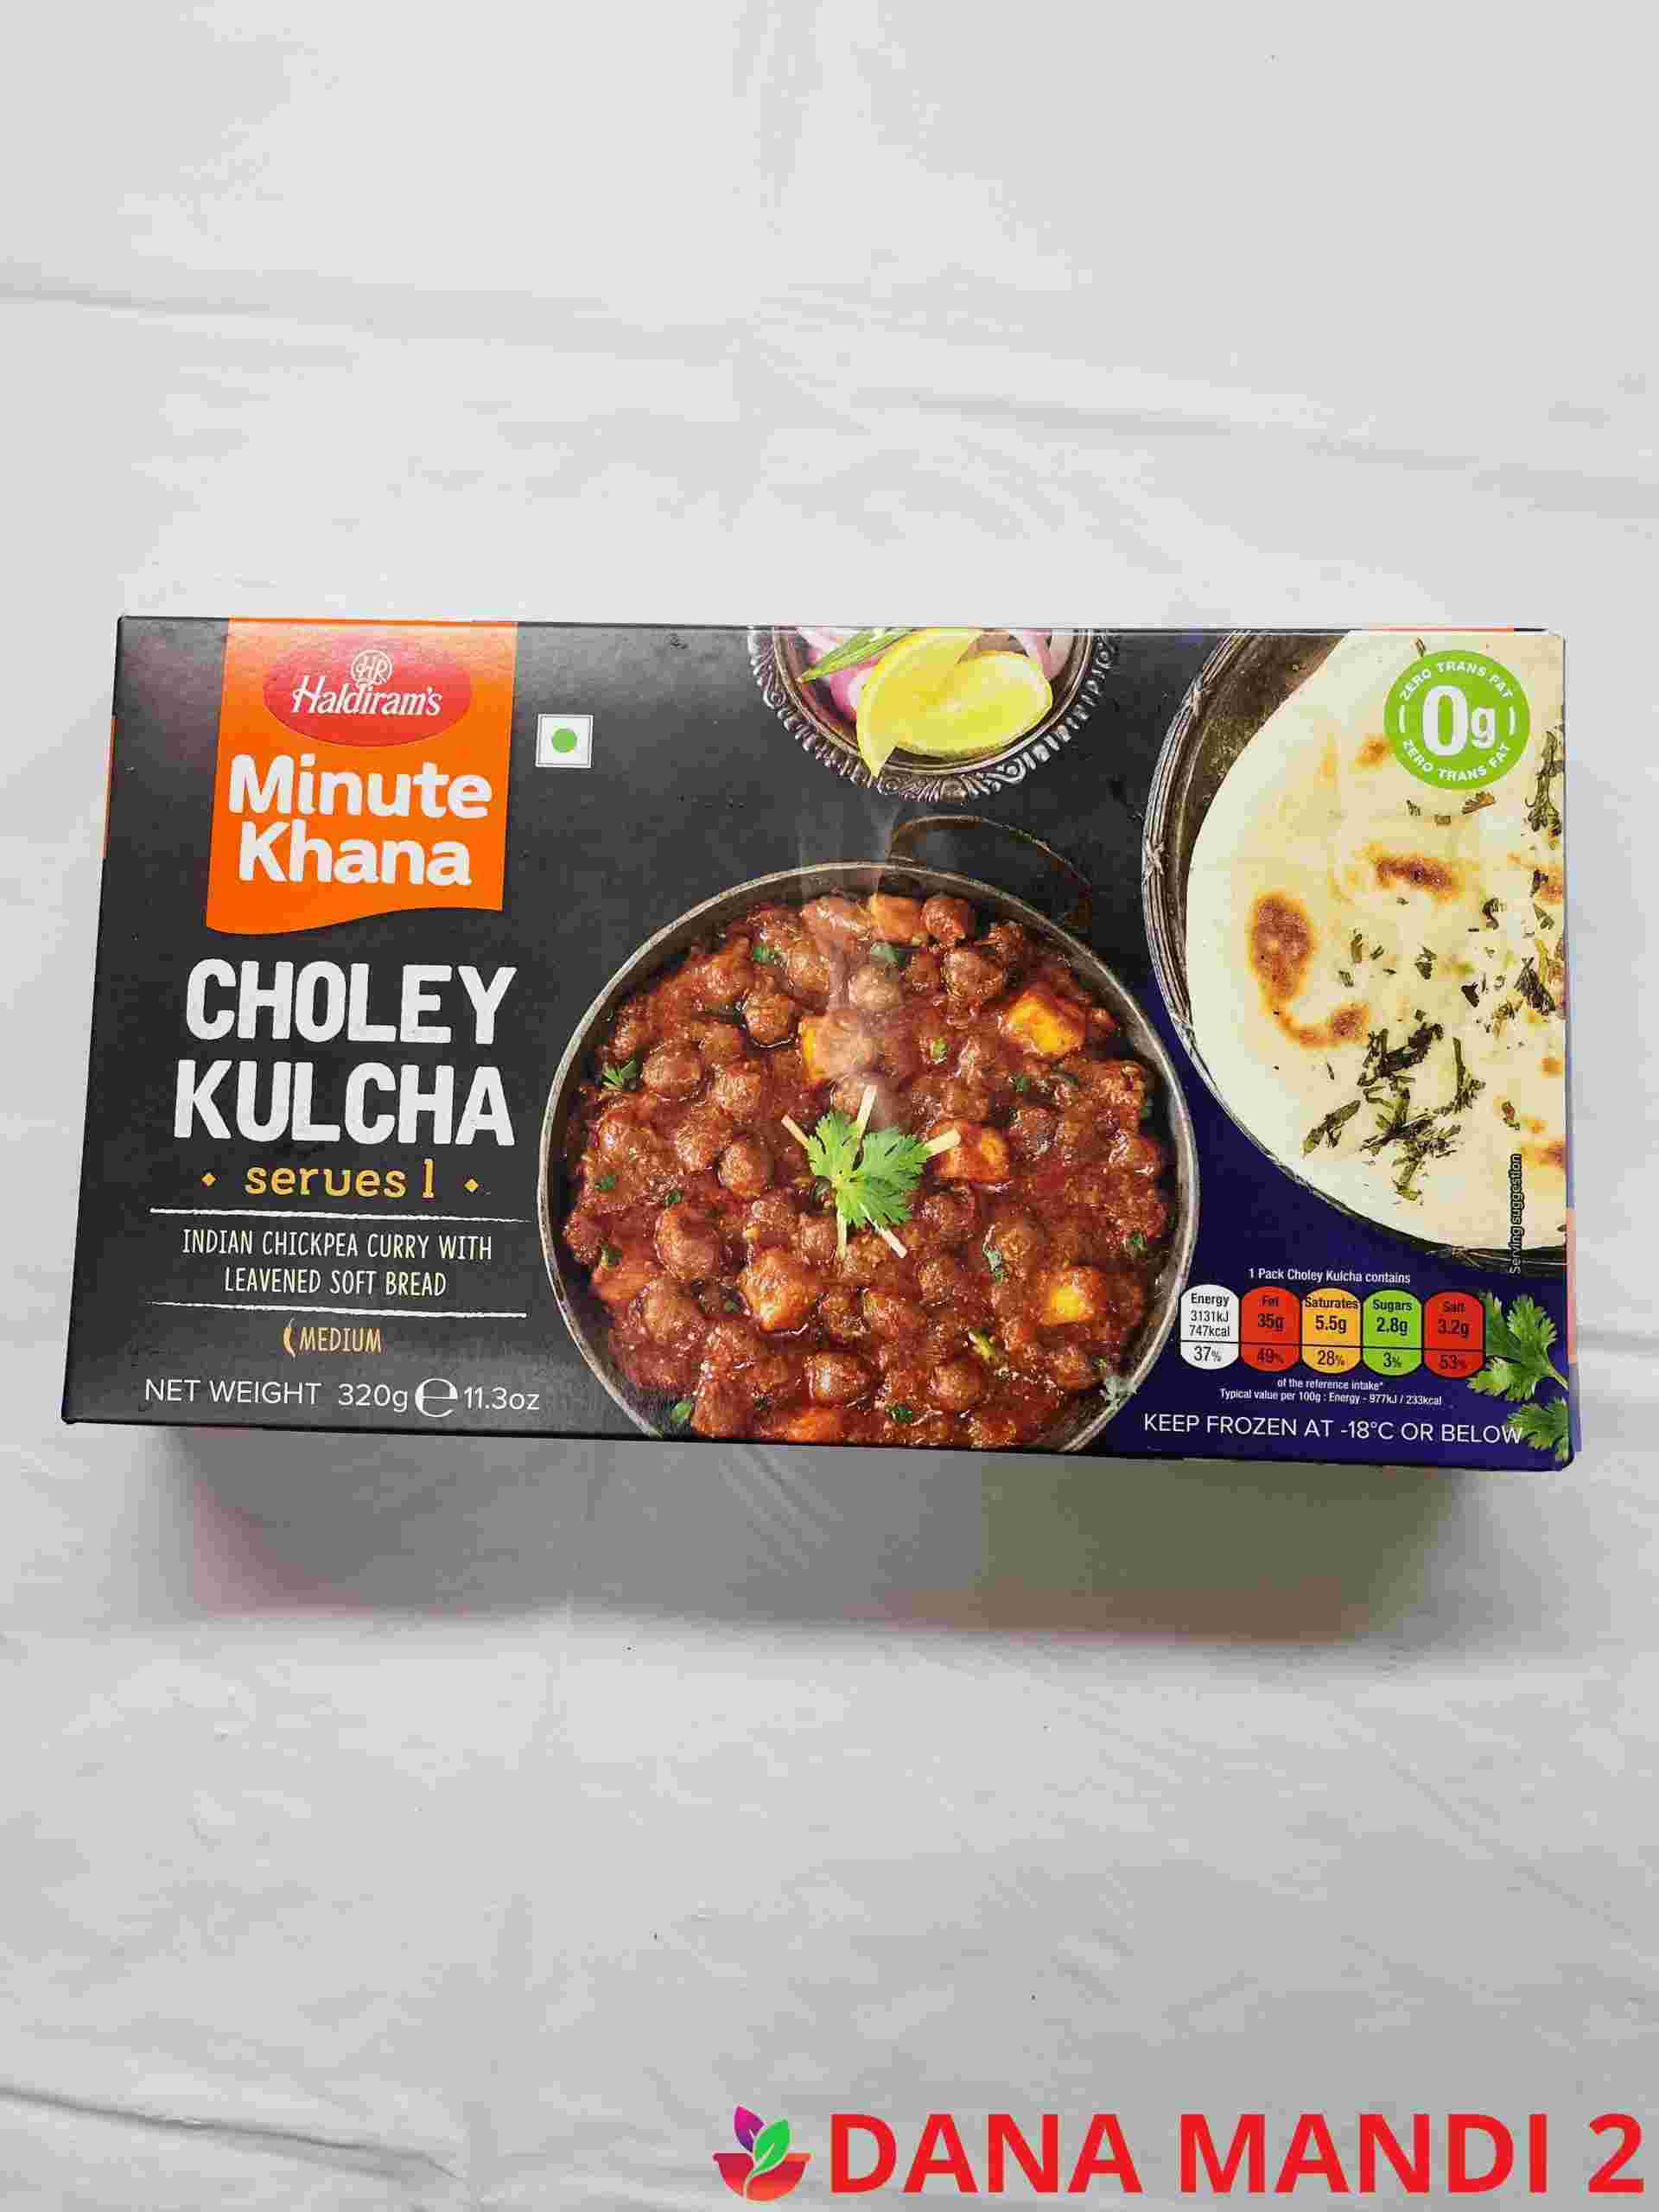 Haldiram's Choley Kulcha